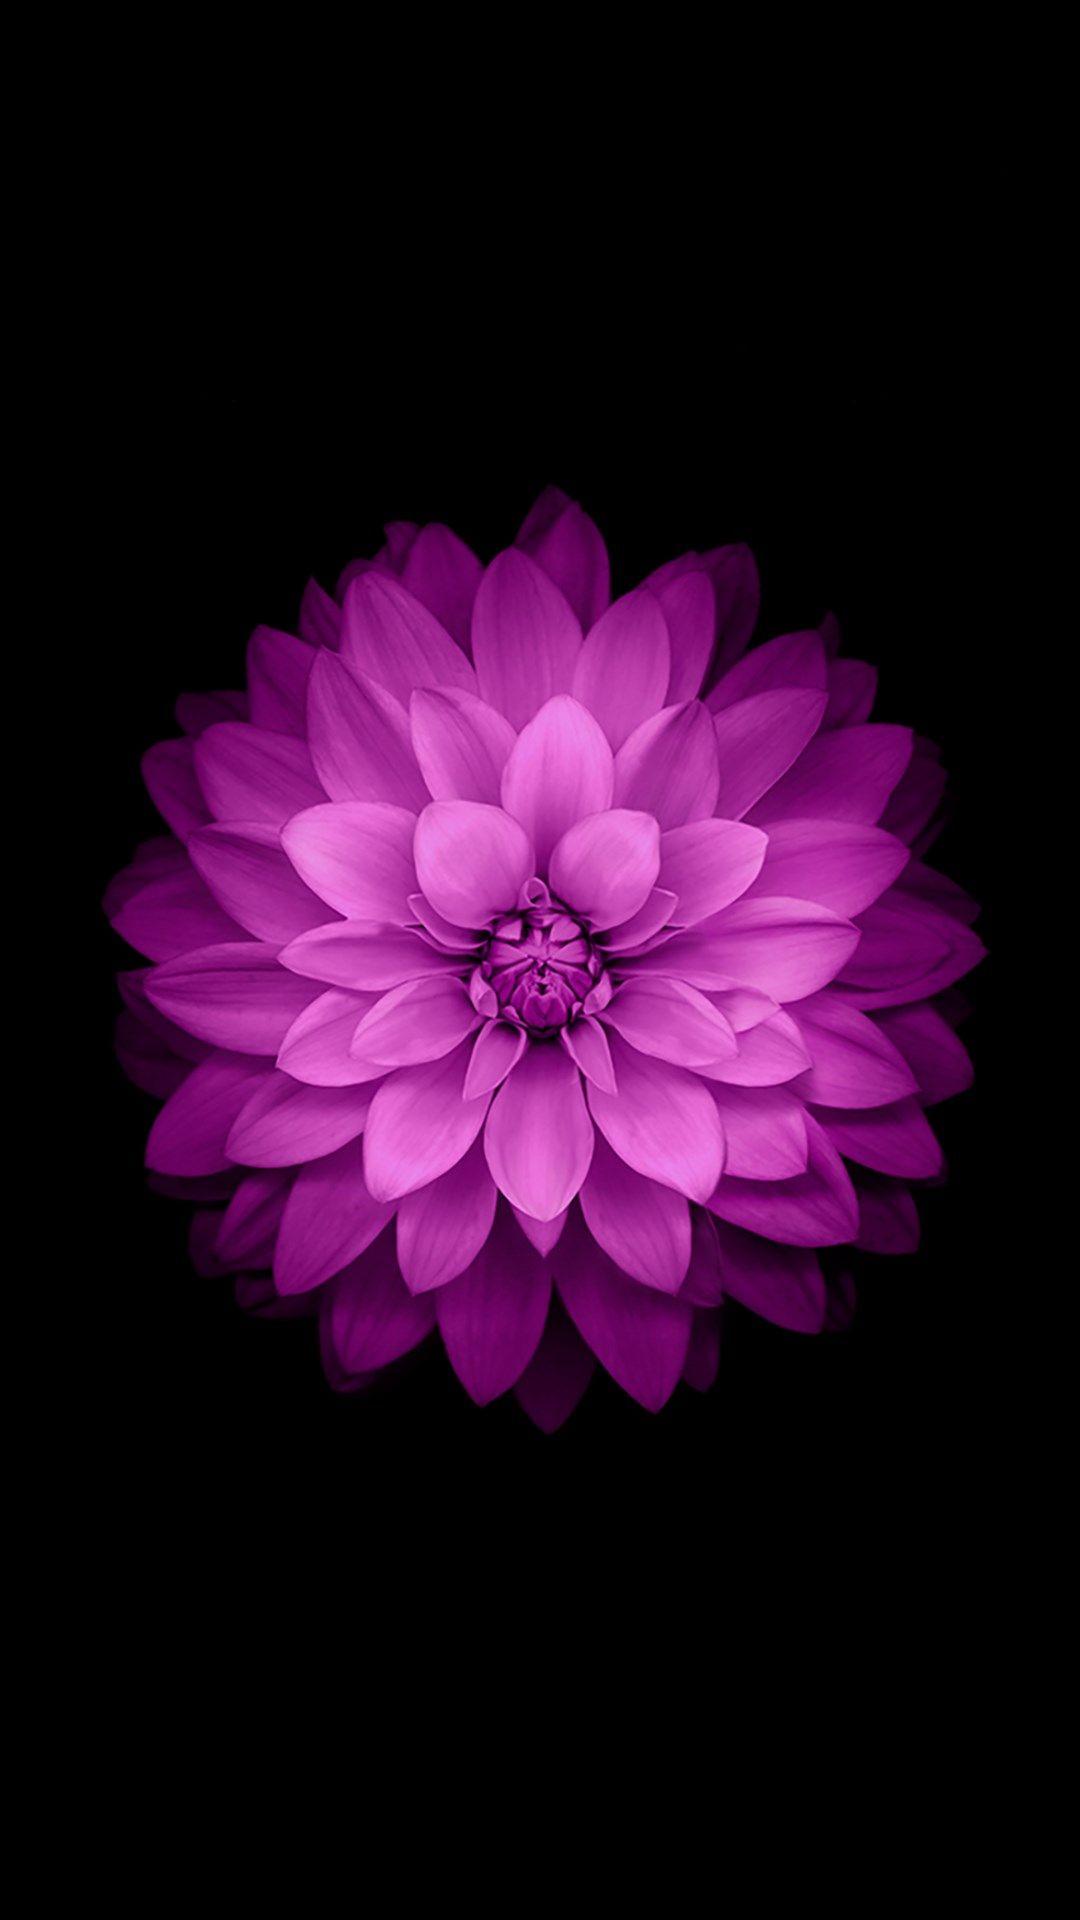 Iphone 6 Plus Wallpaper Official Purple Lotus Flower Flower